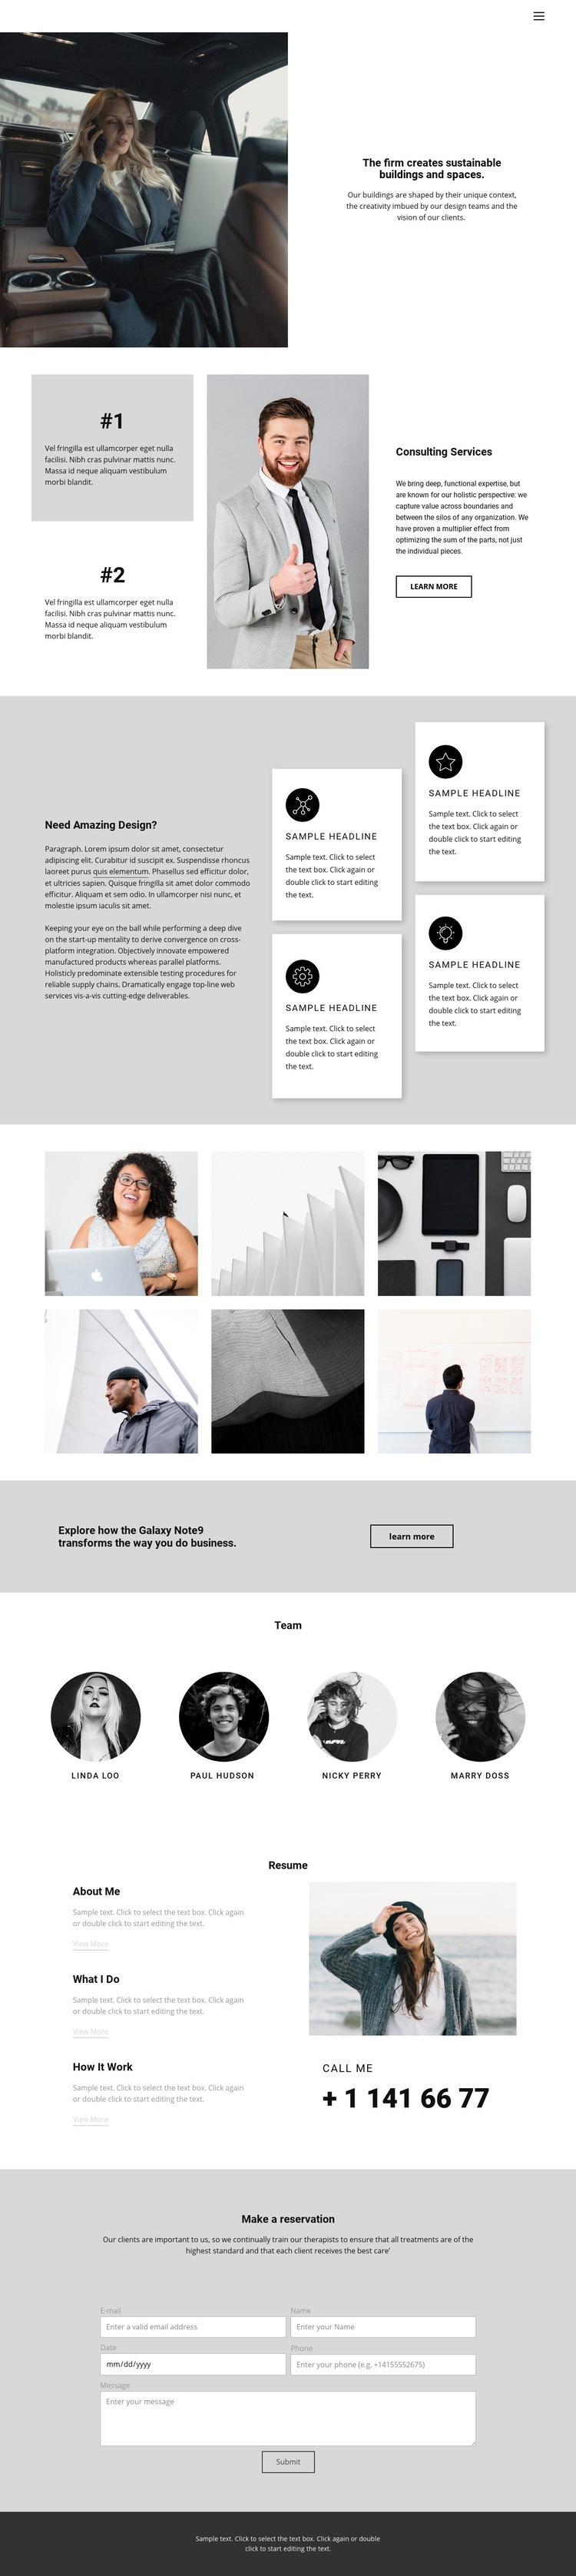 School of Successful Business Web Page Designer